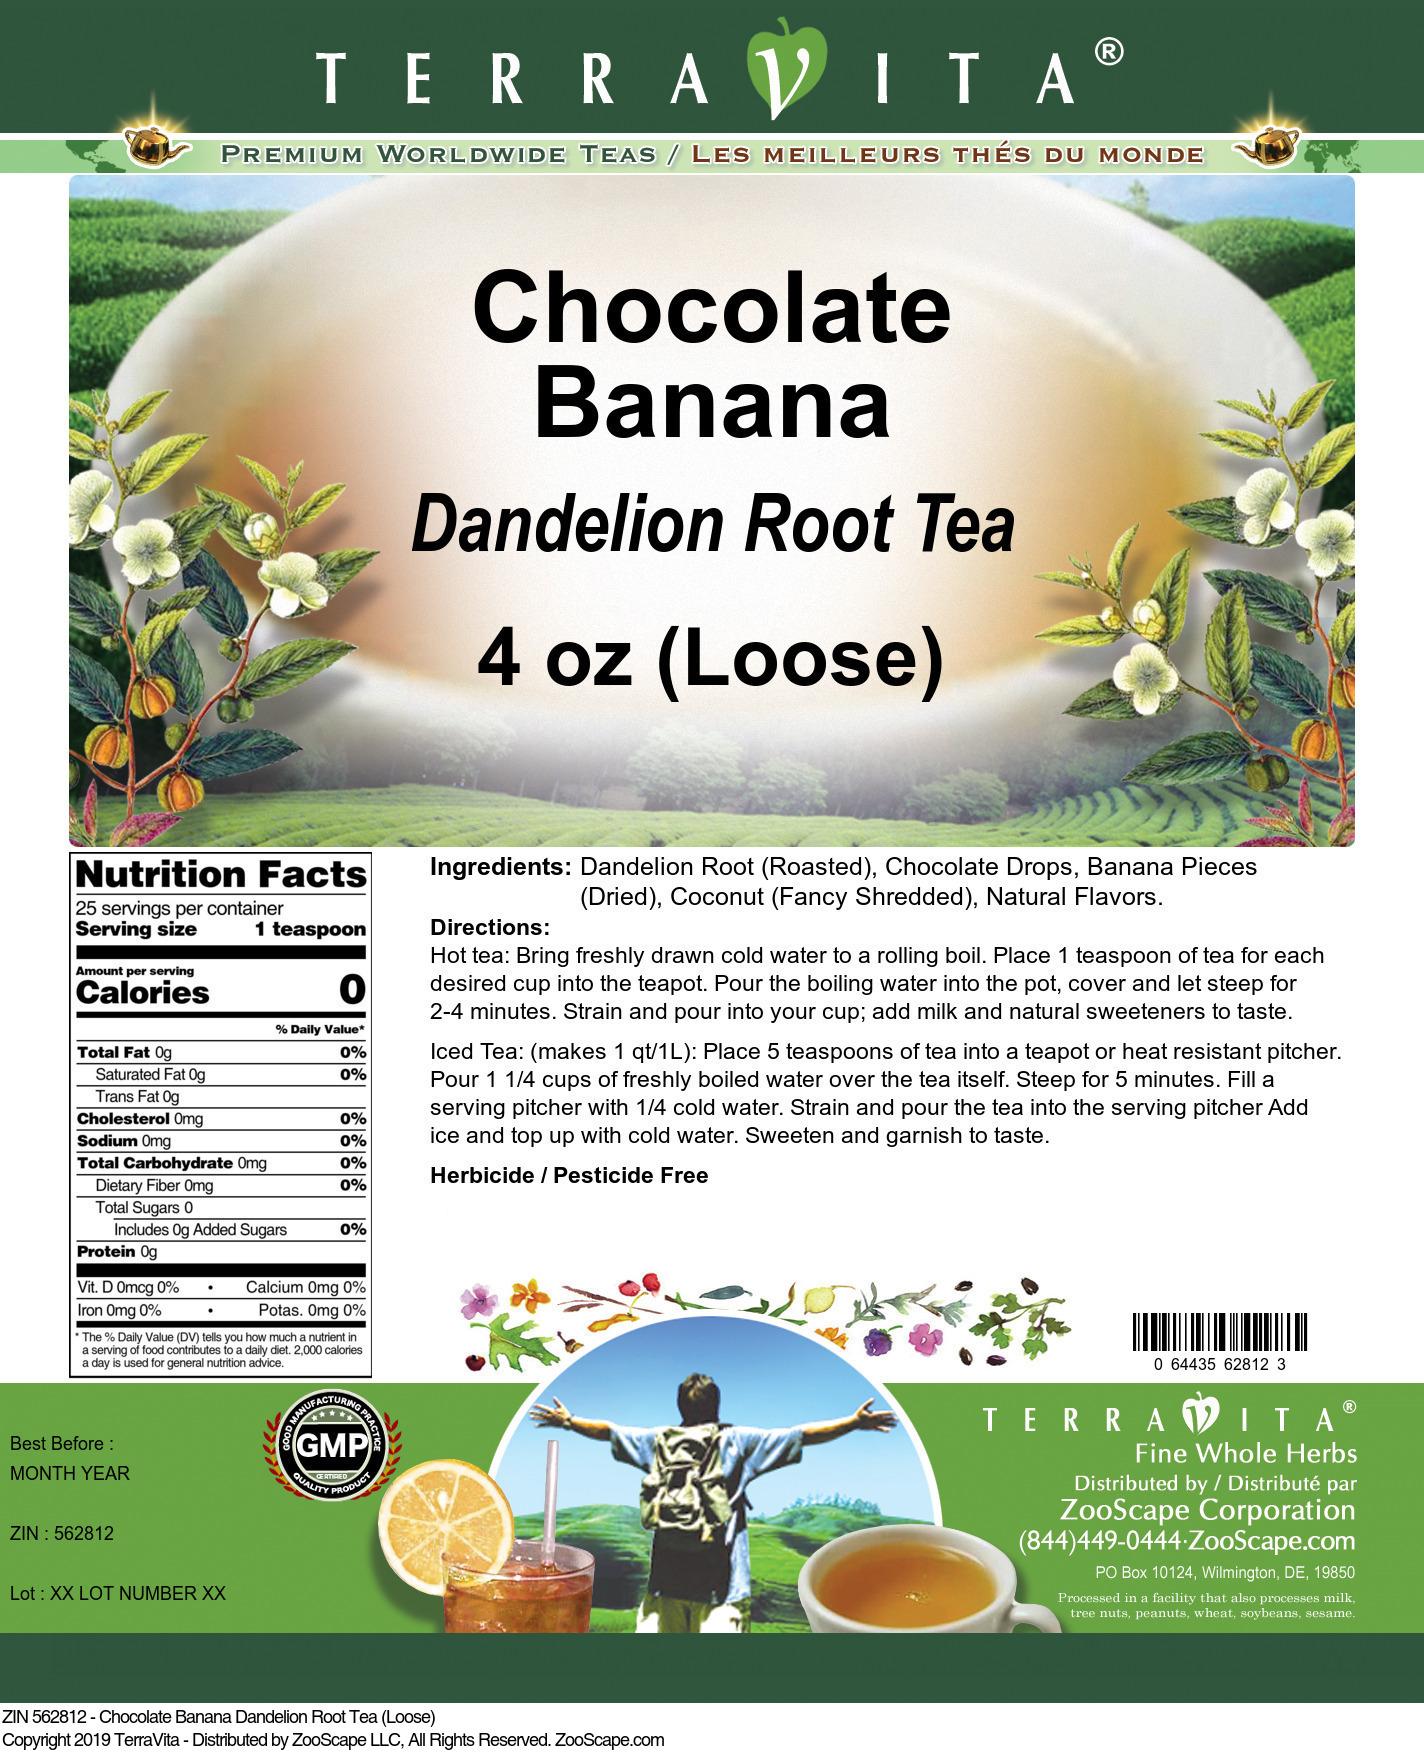 Chocolate Banana Dandelion Root Tea (Loose)